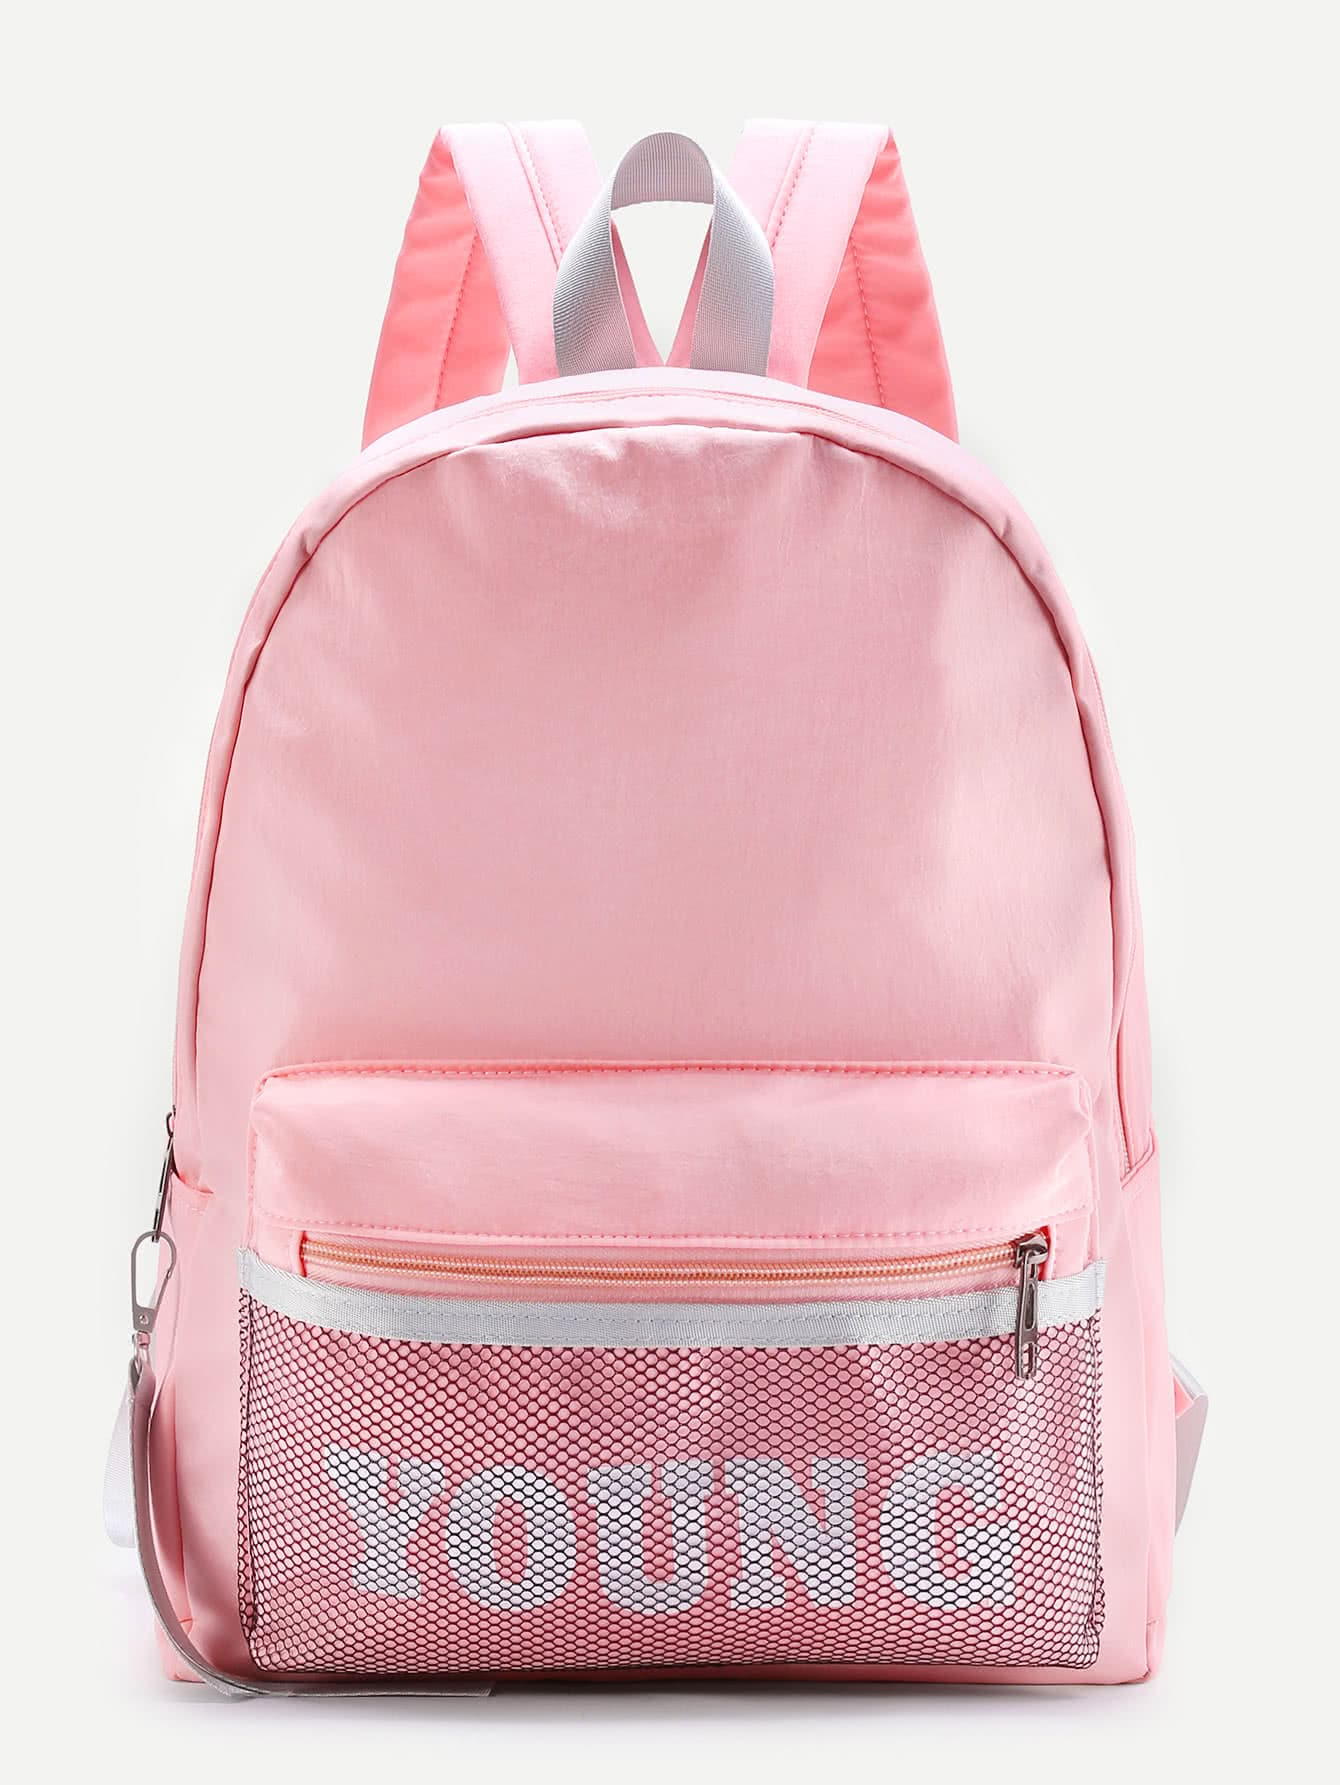 a2ecd7da1c35 Mesh Pocket Design Canvas Backpack EmmaCloth-Women Fast Fashion Online